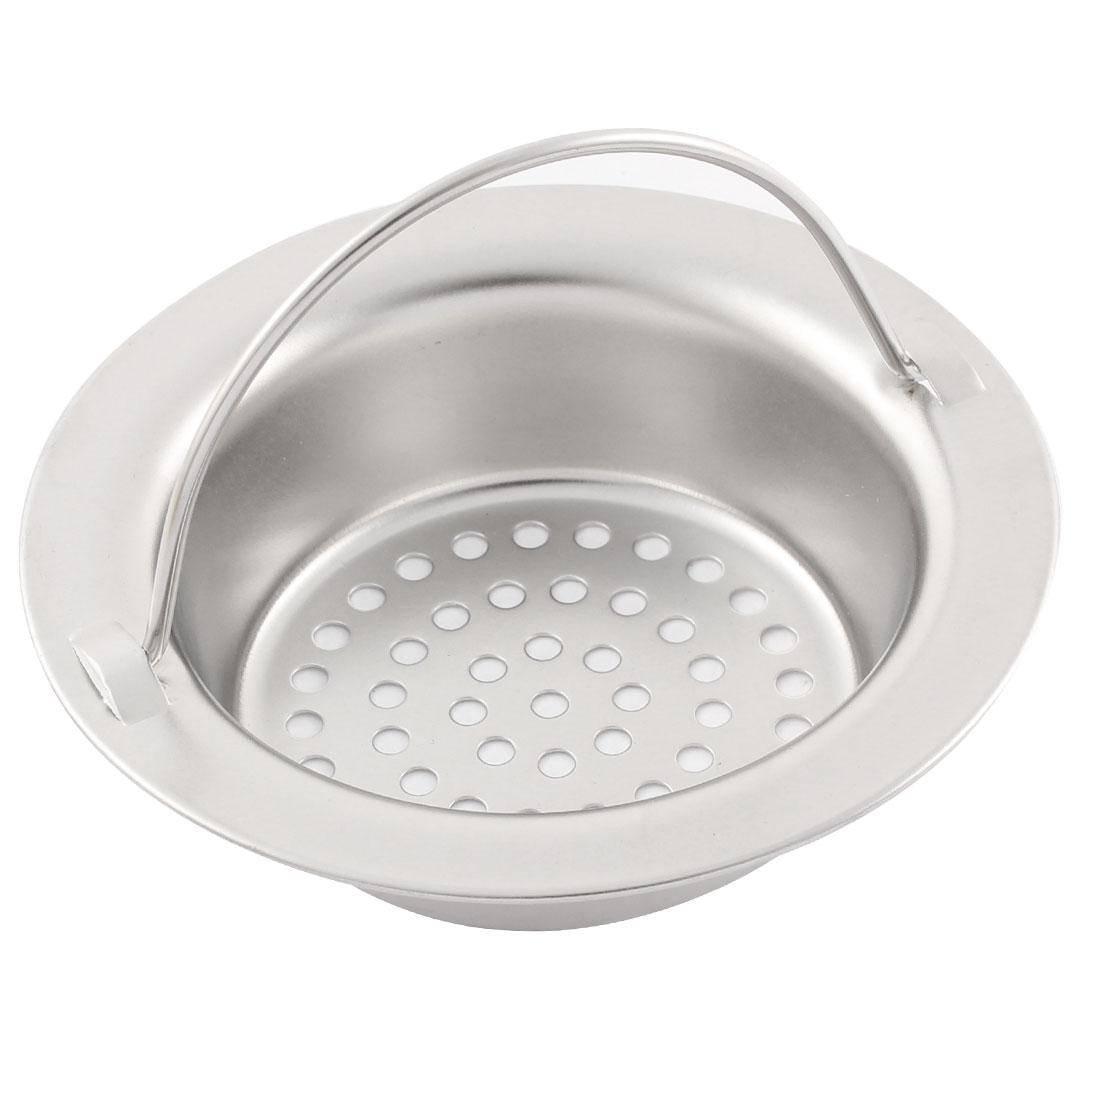 Kitchen Bath Stainless Steel Handle Mesh Sink Drain Basin Strainer Stopper